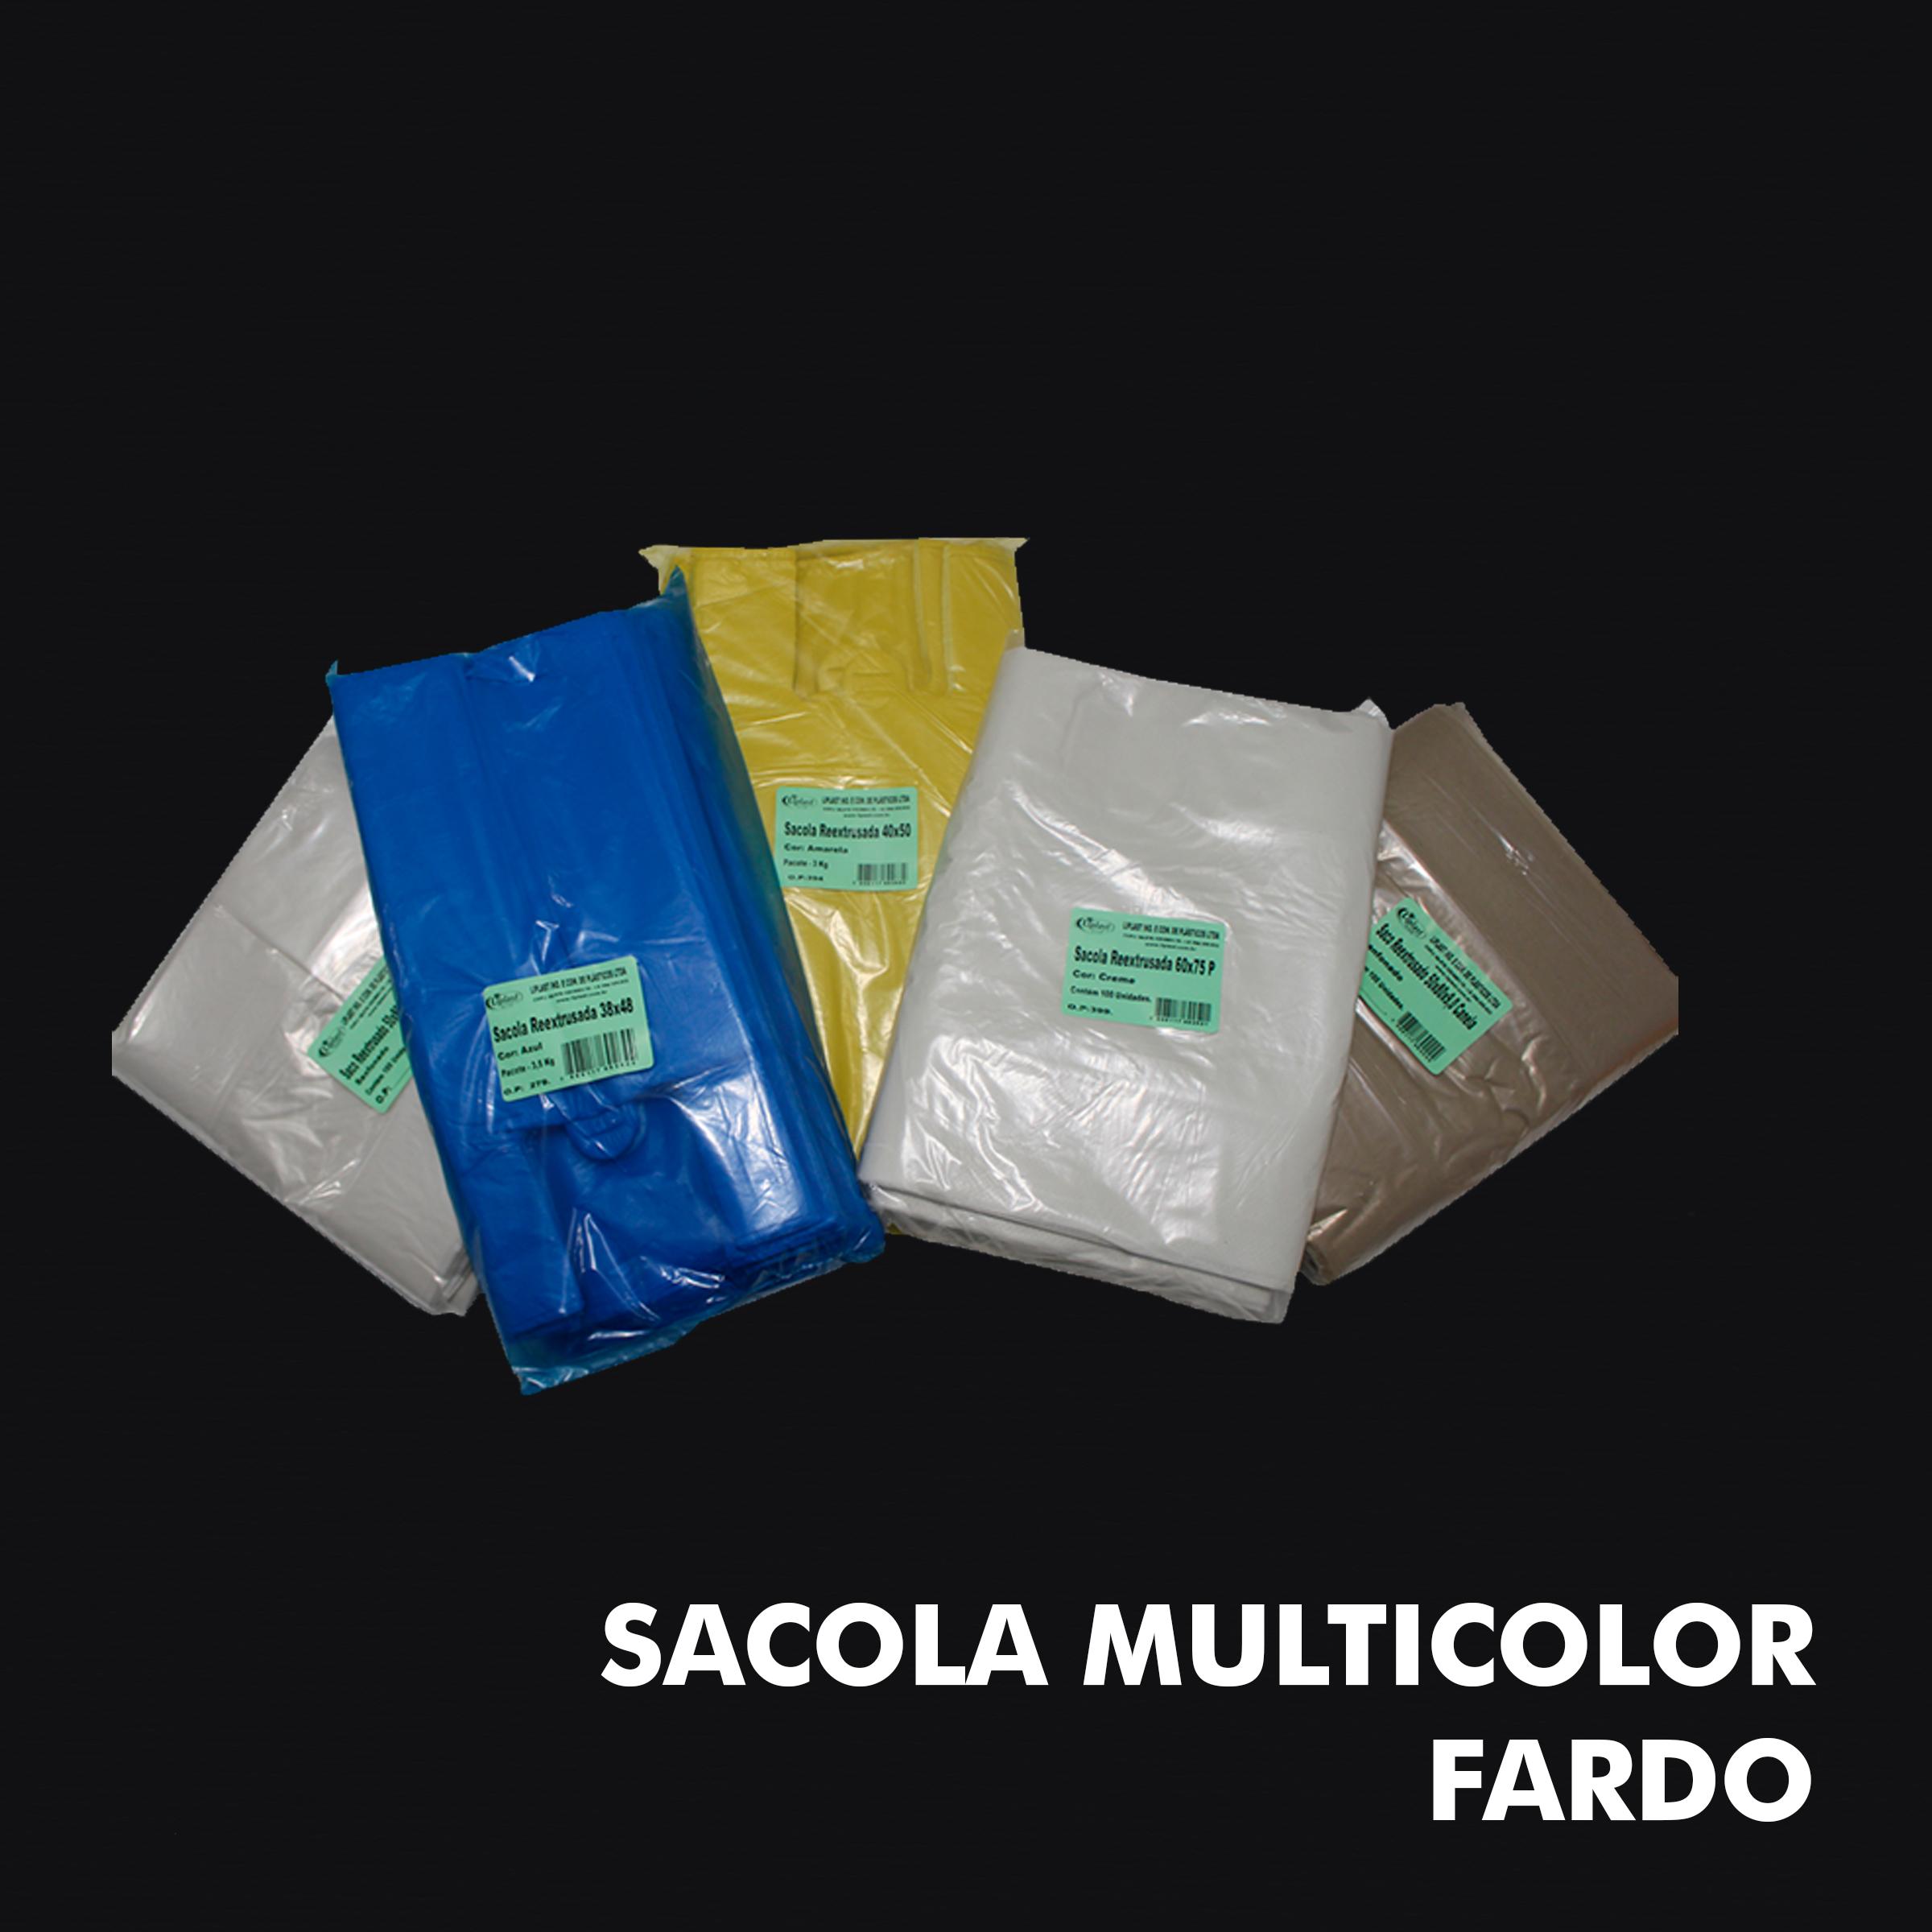 Sacola Multicolor – Fardo - RF